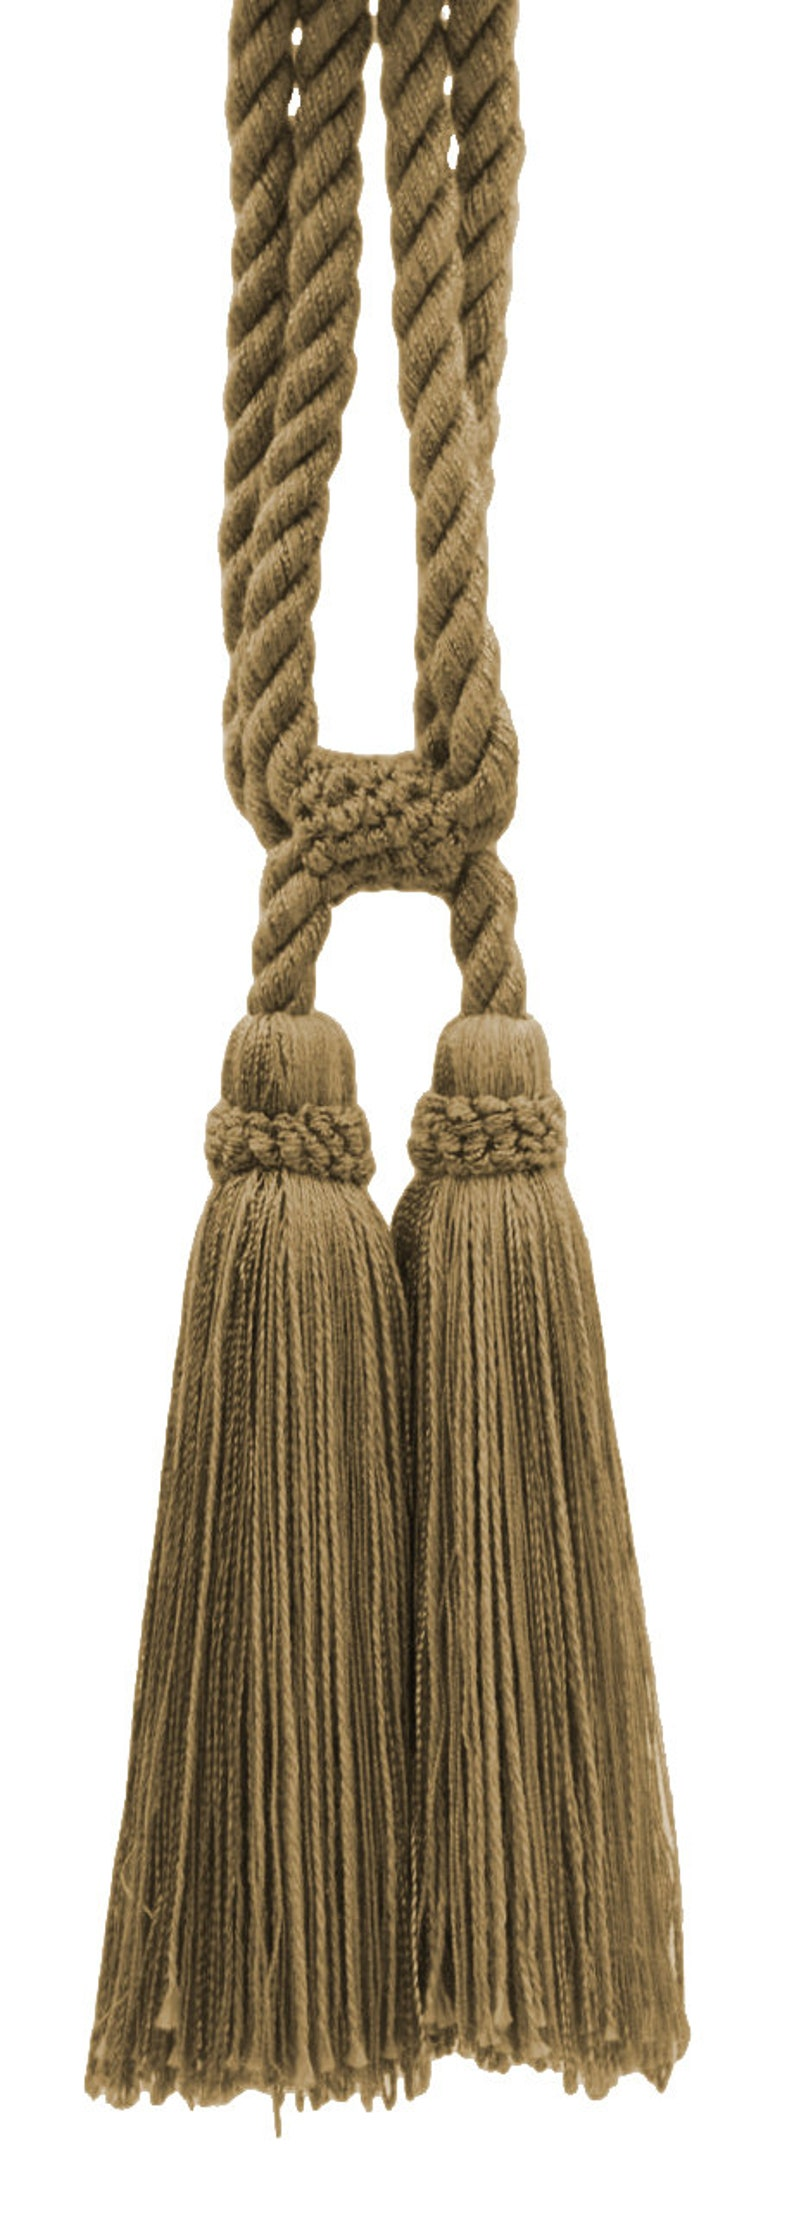 Beautiful Camel Gold Curtain /& Drapery Double Tassel Tieback|5 12 tassel|27  Spread |38 Cord|Style# TBC055 embrace